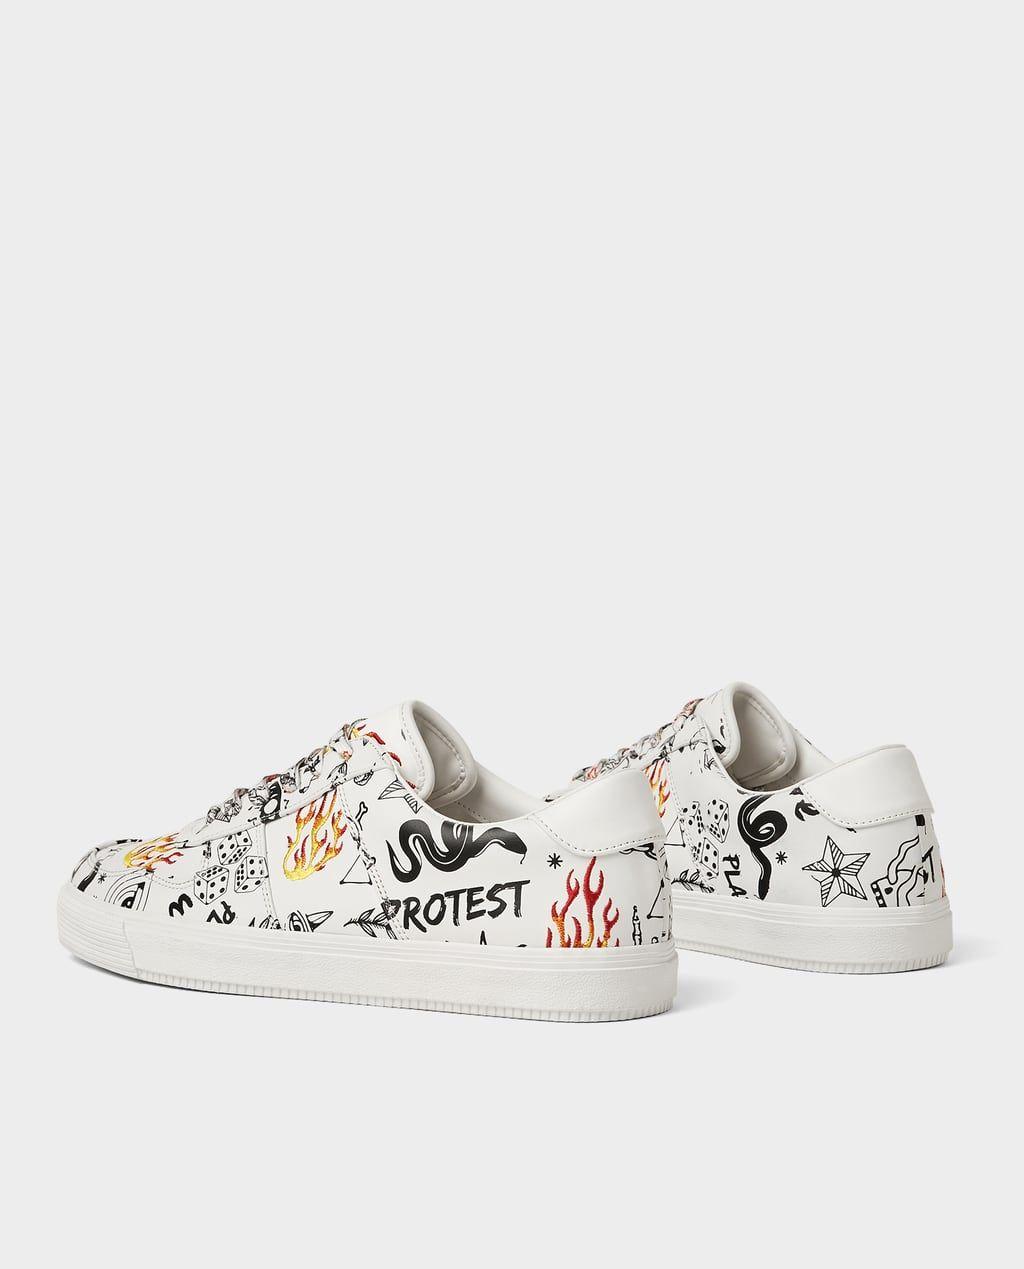 GRAFFITI SNEAKERS from Zara   Sneakers